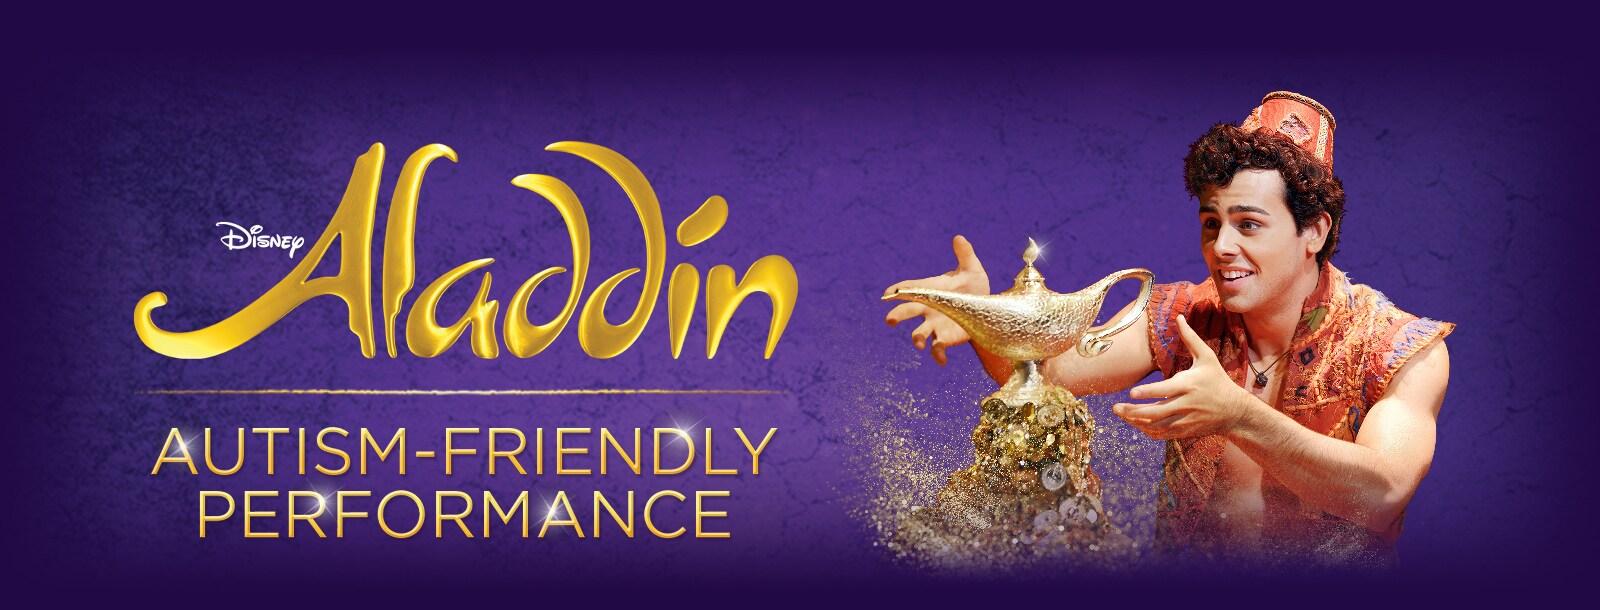 Live Shows: Aladdin The Musical - Aladdin AFP